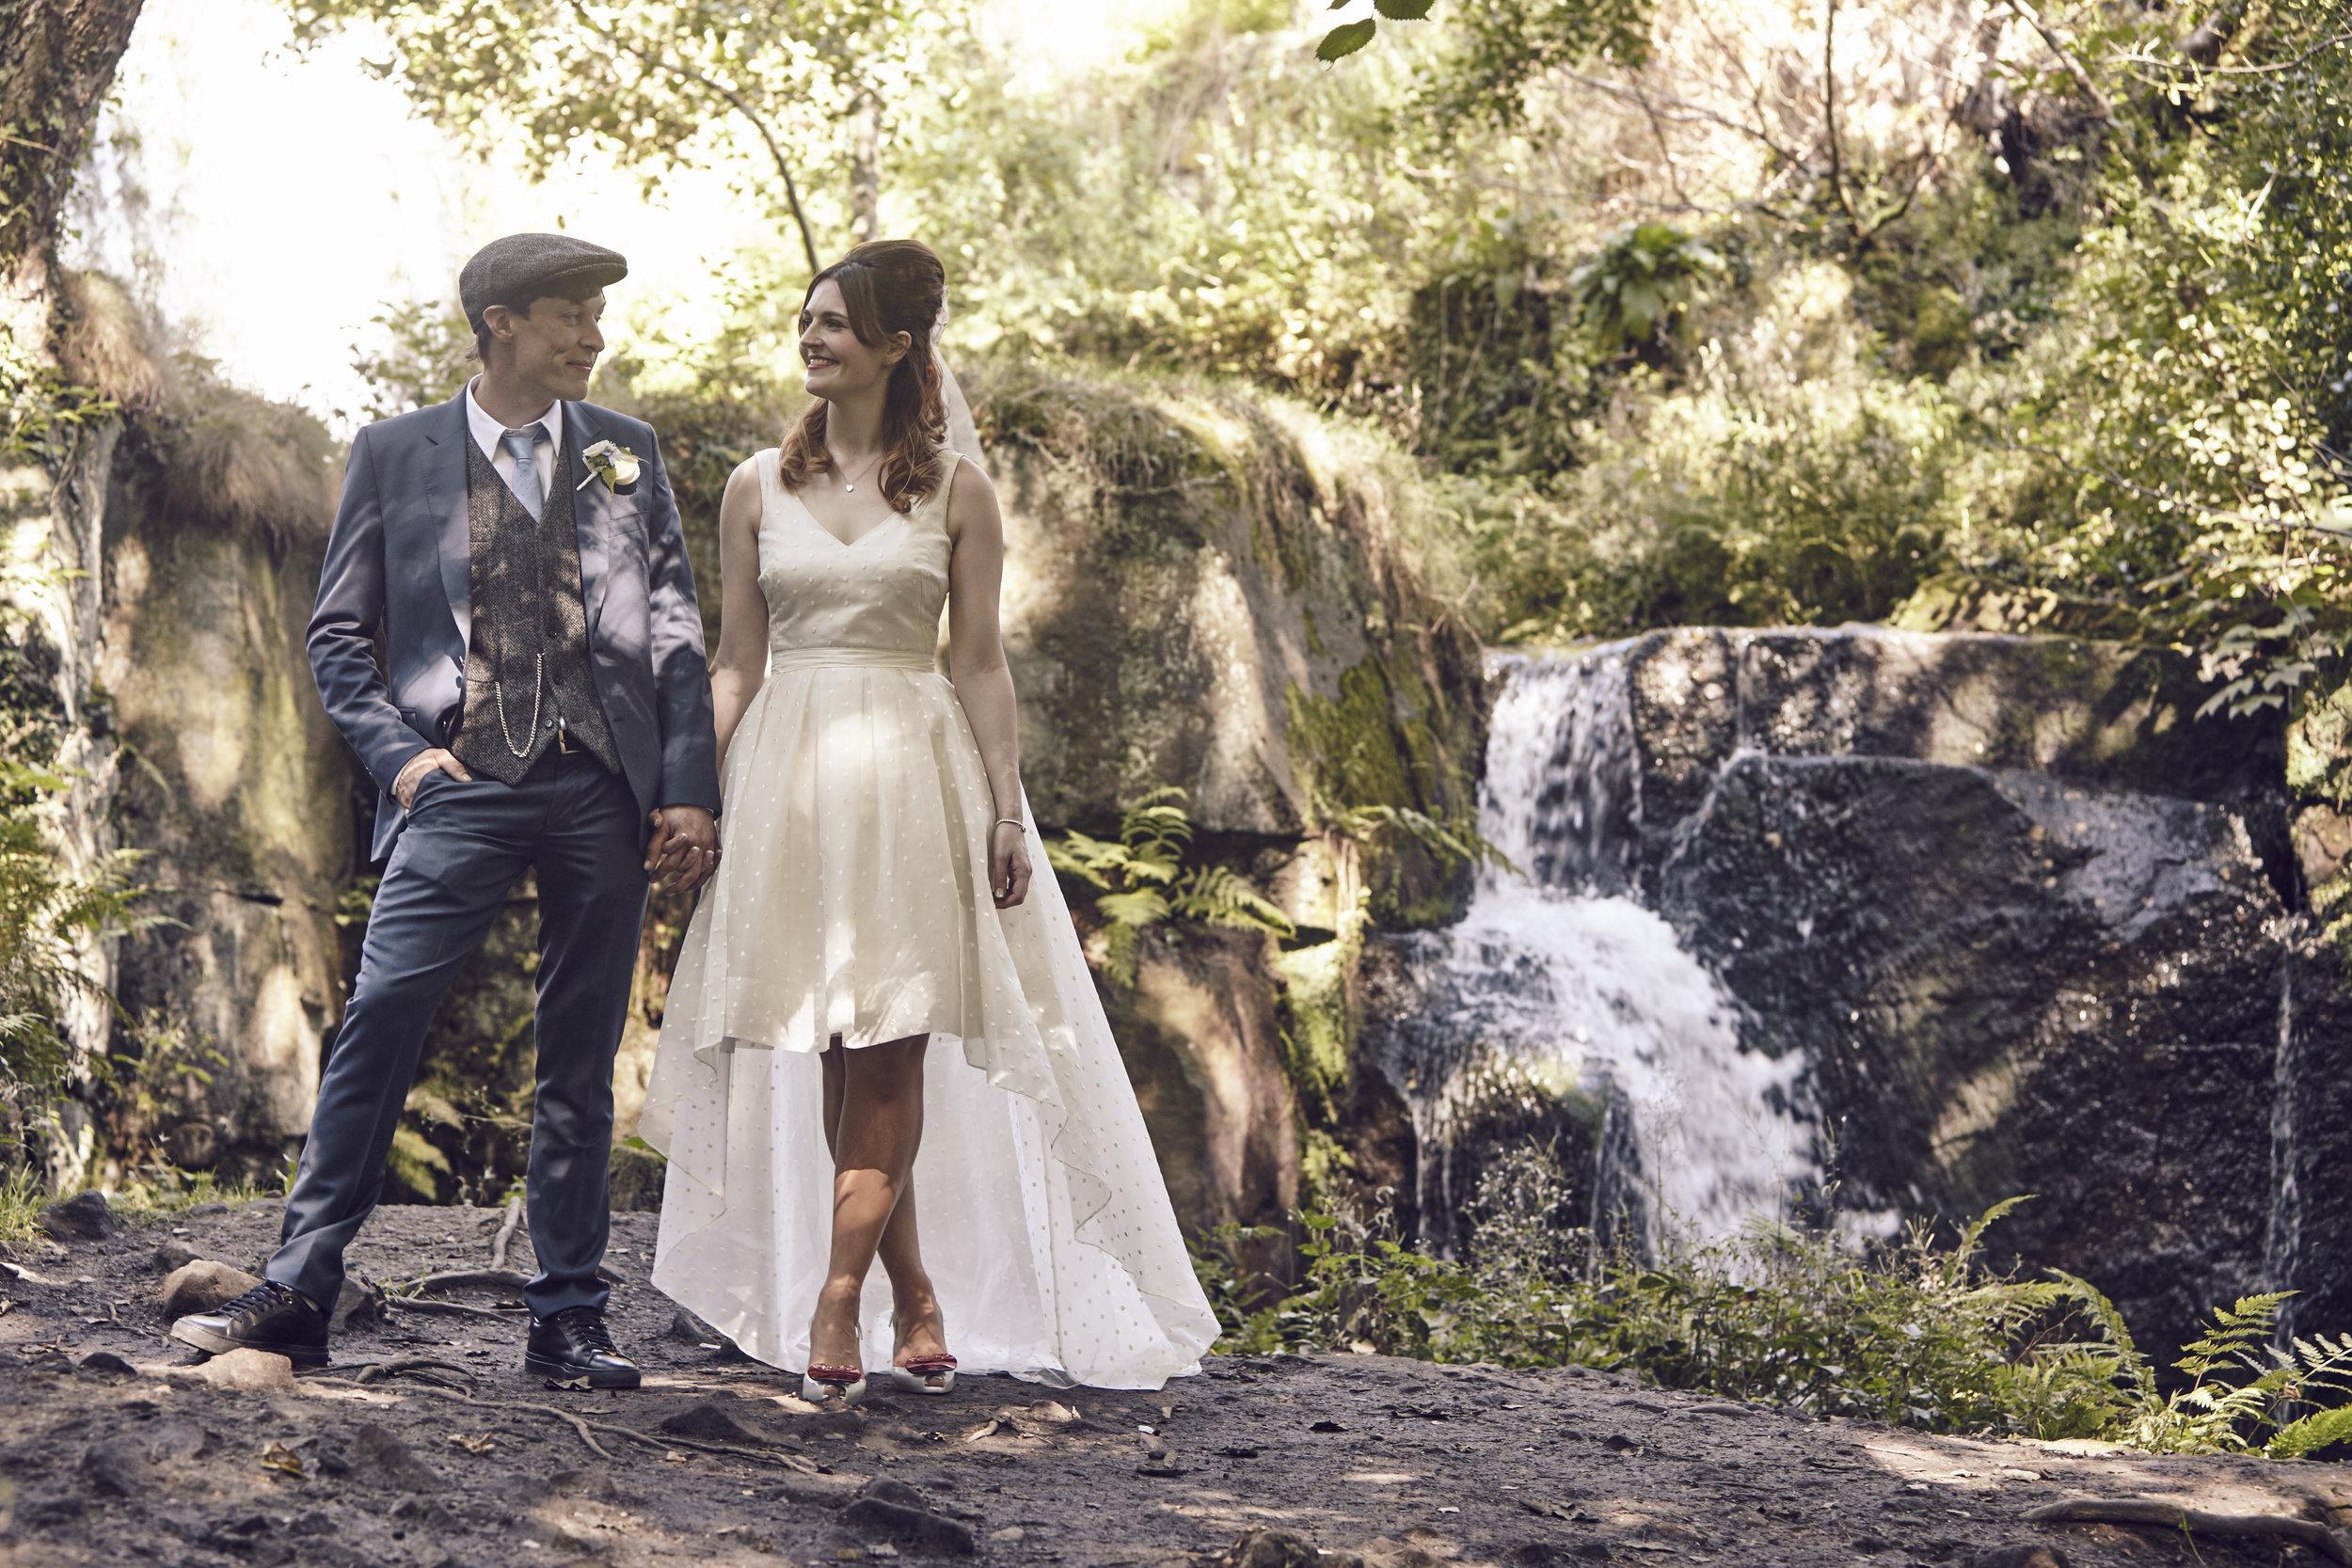 Suzi-Matlock-Polka-Dot-Bespoke-Wedding-Dress-High-Low-Susanna-Greening-Designs-Derbyshire-10